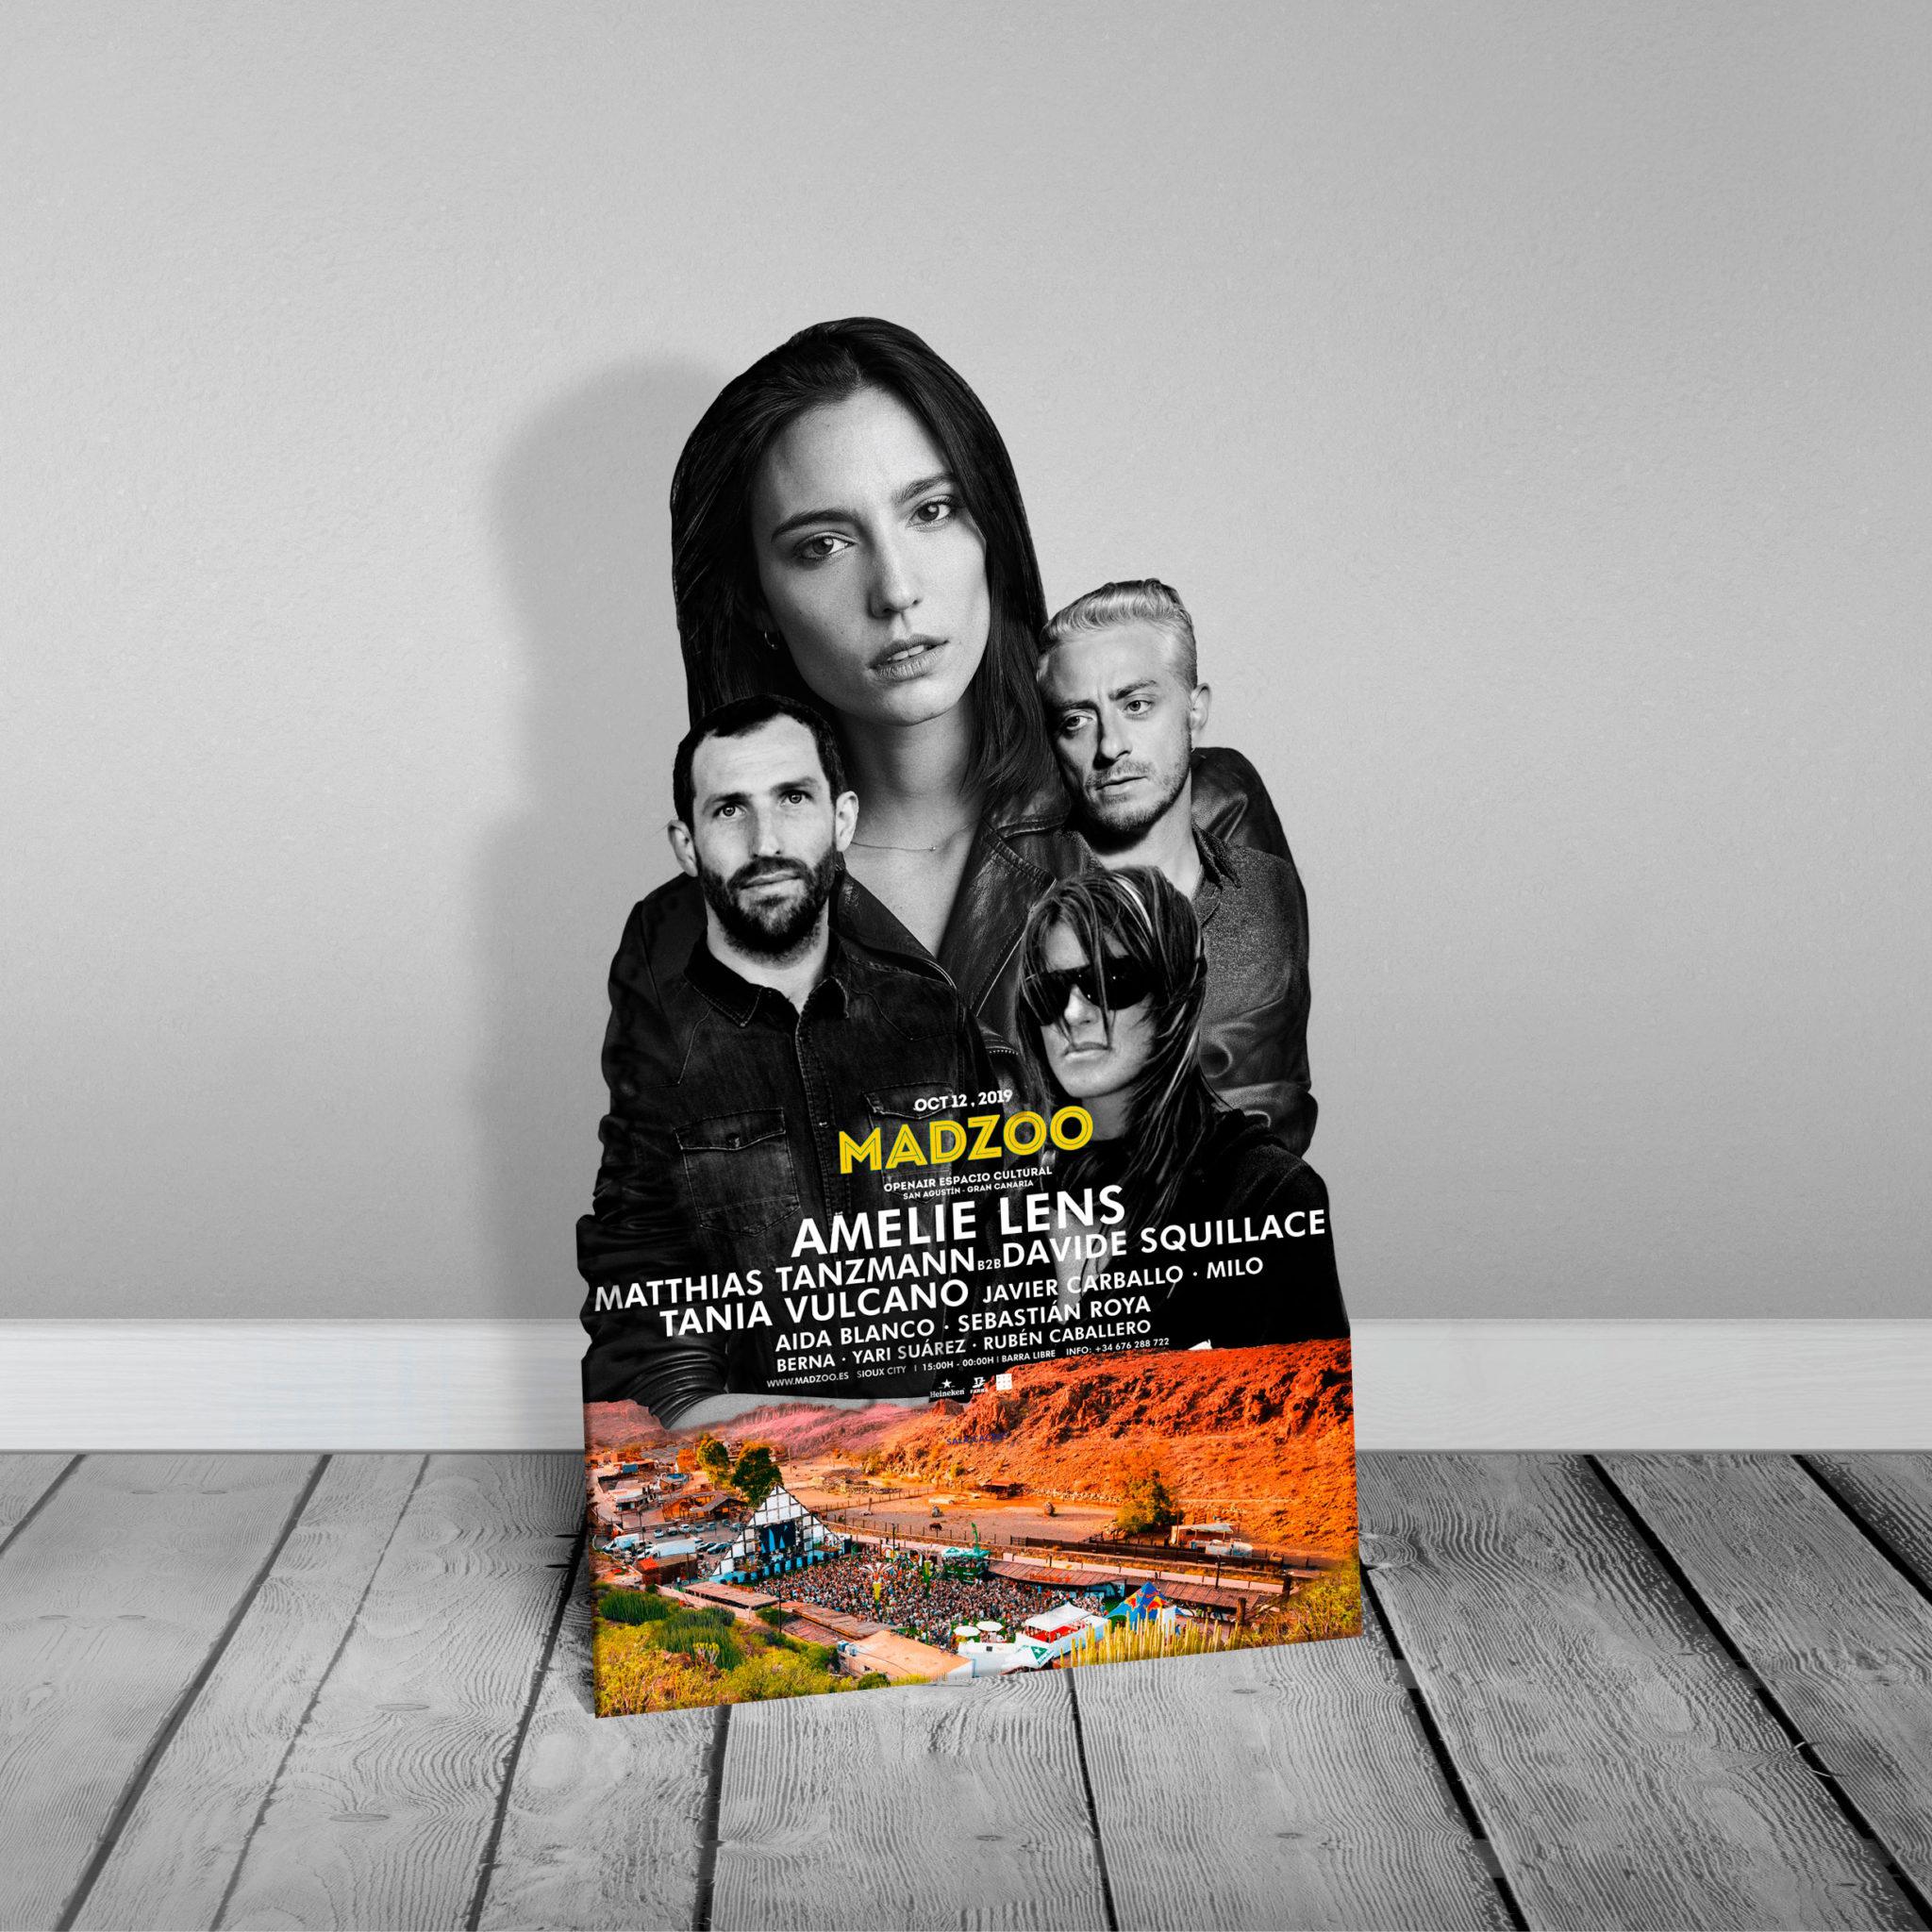 Madzoo Soporte Publicitario Amelie Lens